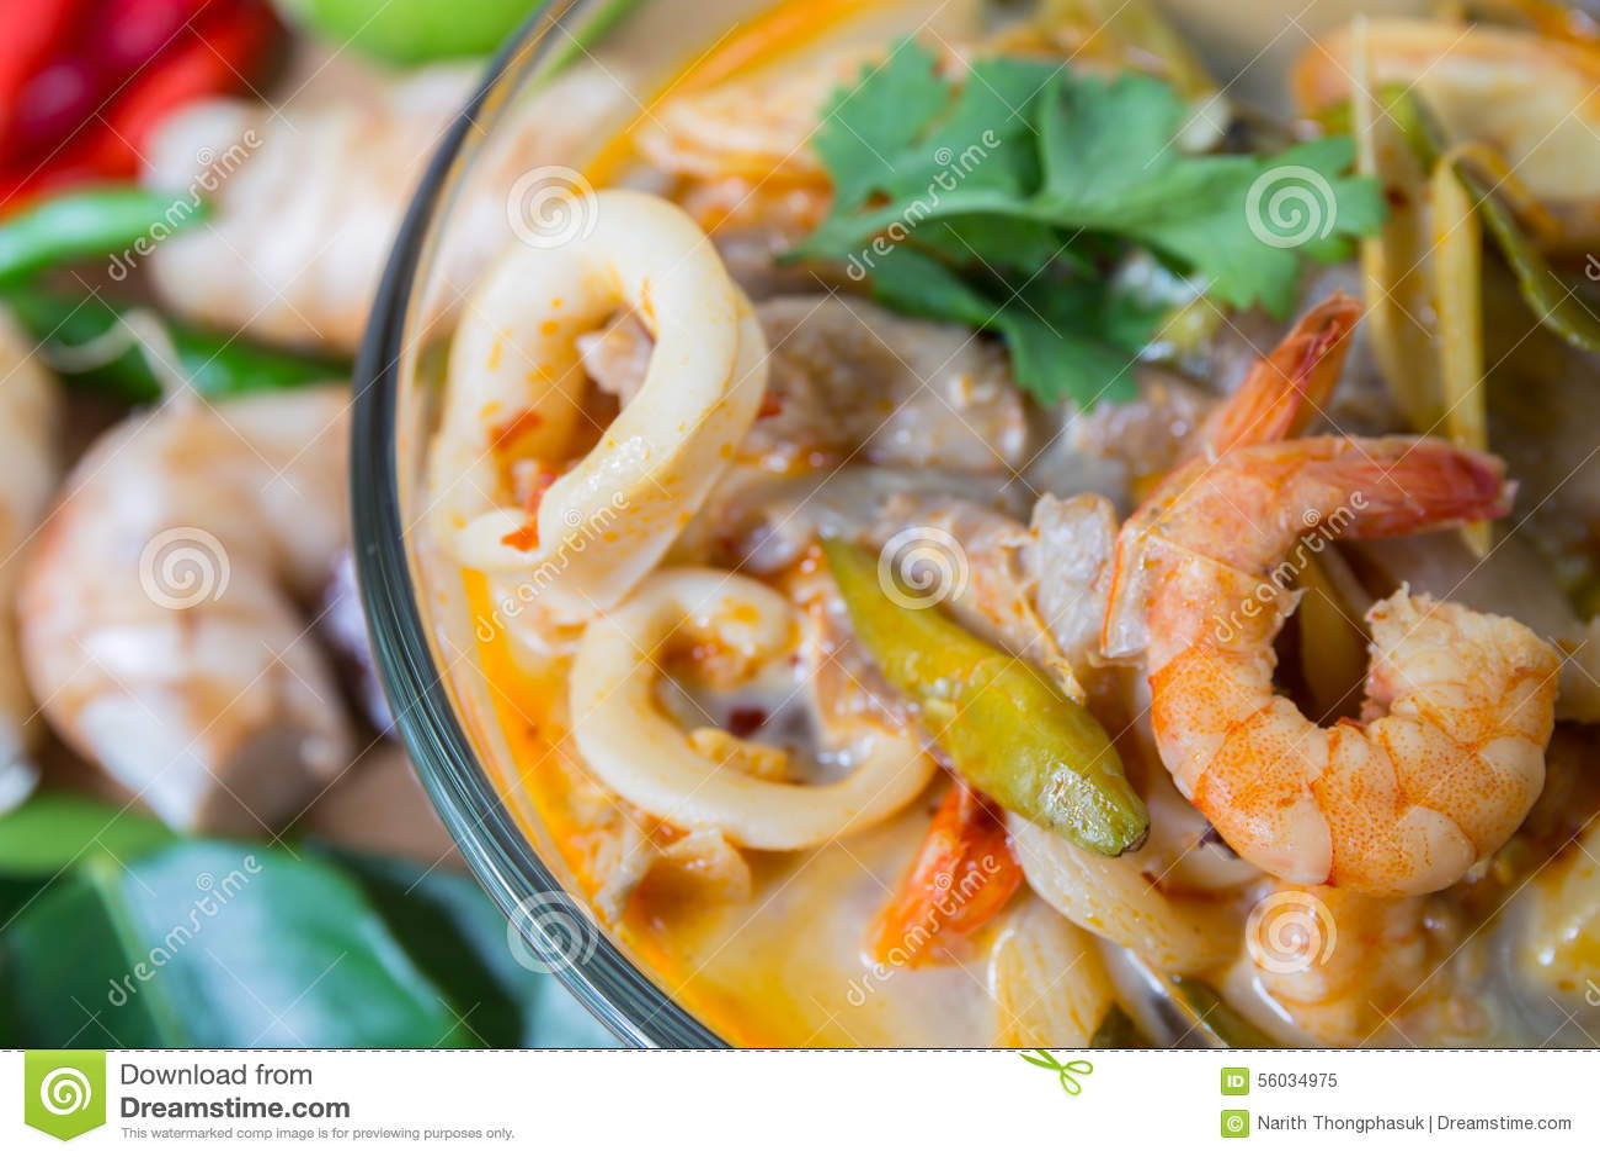 Суп специи Тома yum тайский, тайская еда